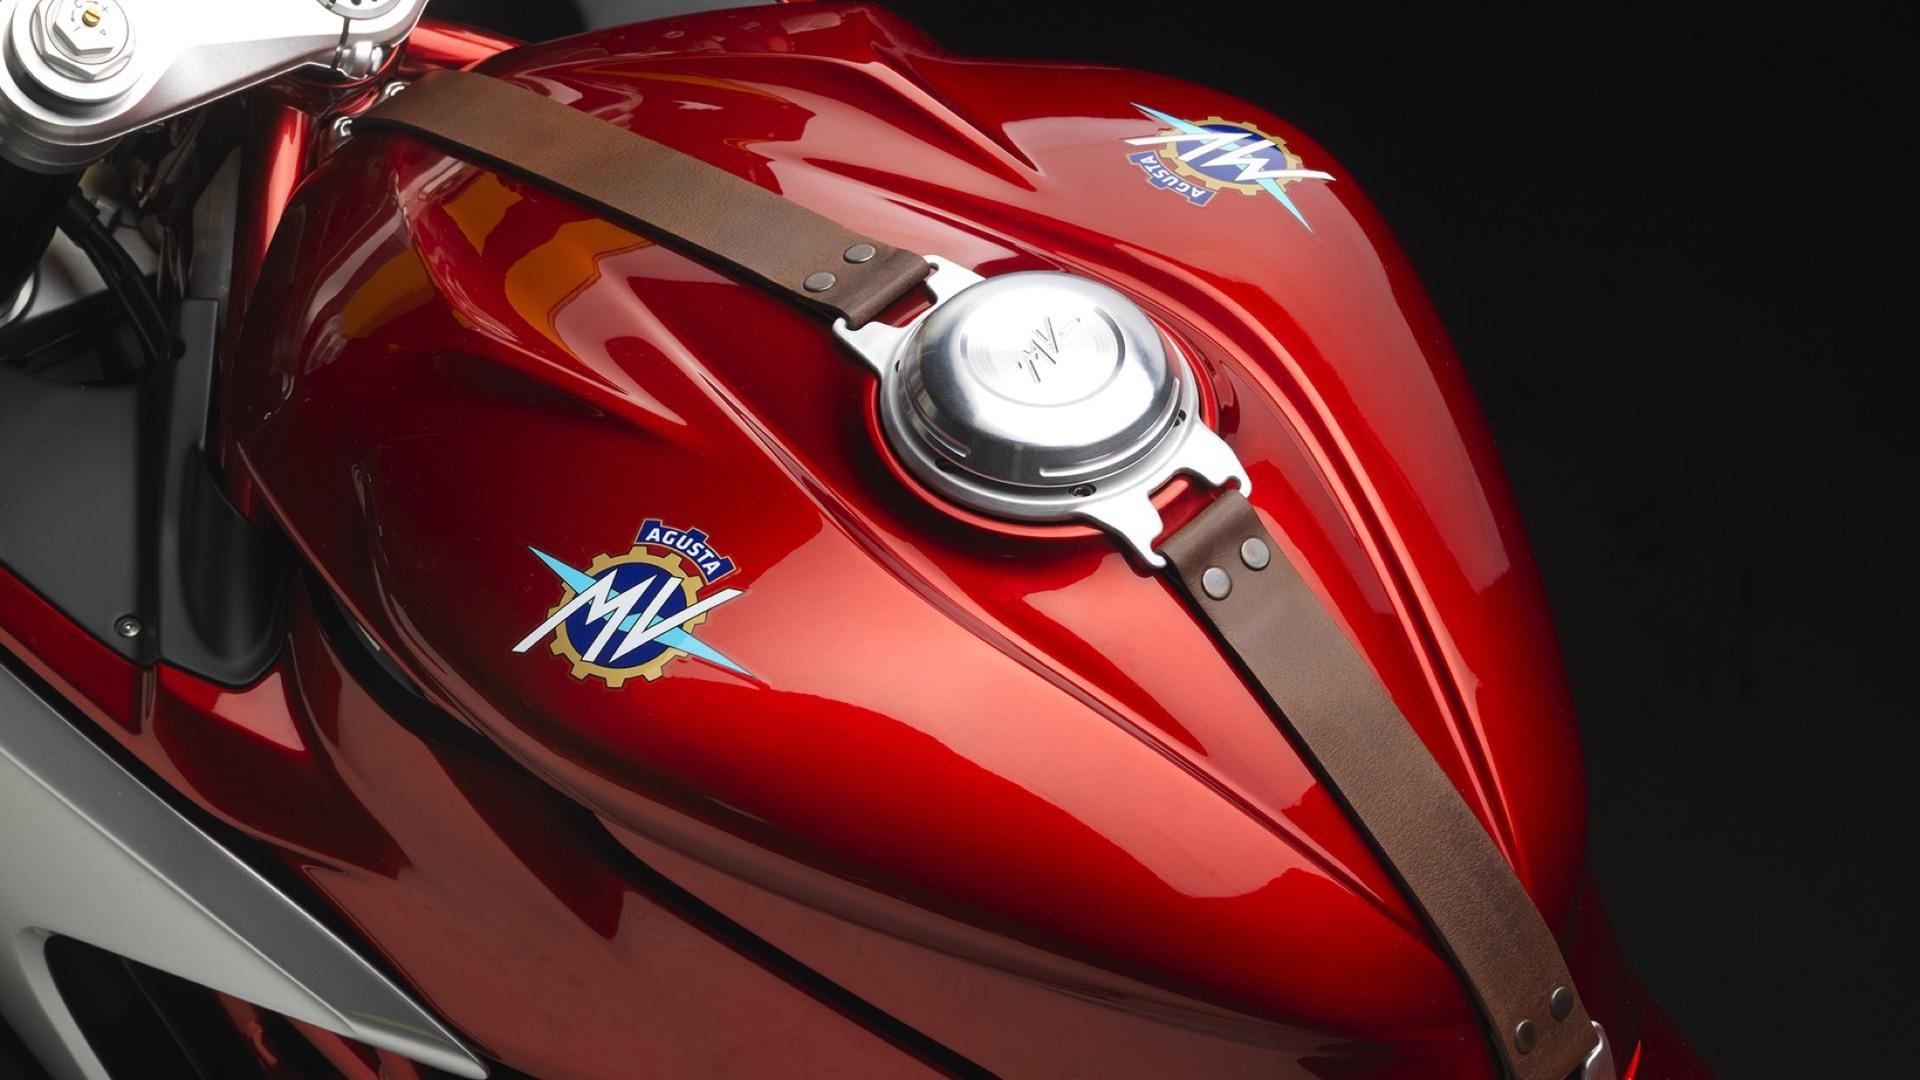 MV Agusta llega a un acuerdo con Qianjiang para distribuir sus motos en China